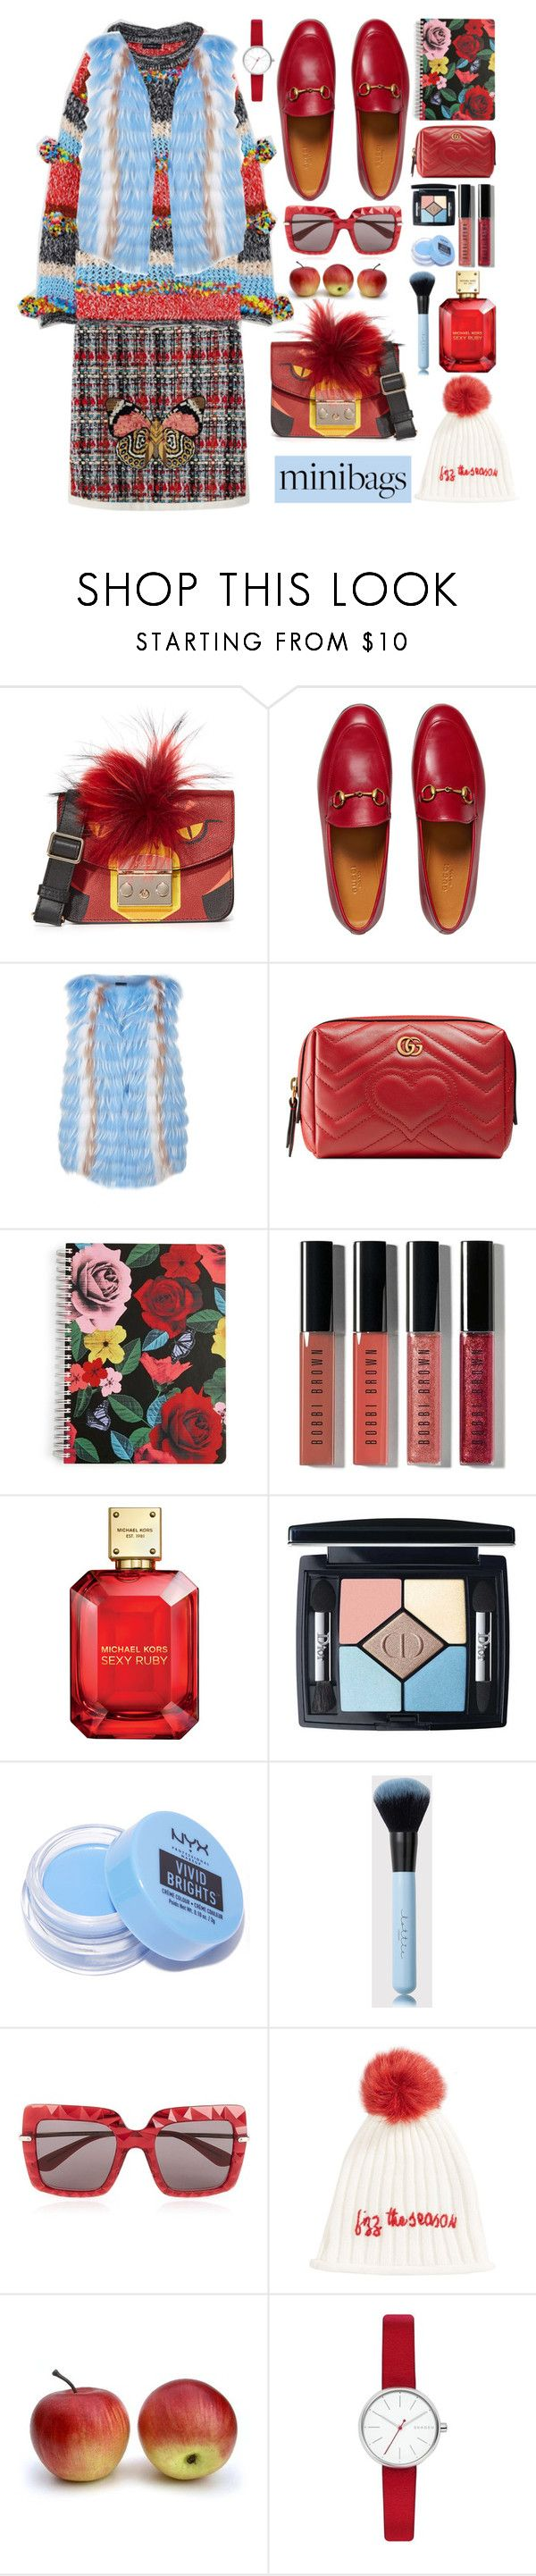 """Mini Bag Contest"" by kristina-susanto ❤ liked on Polyvore featuring Furla, Gucci, Sportalm, Vera Bradley, Bobbi Brown Cosmetics, Christian Dior, NYX, Dolce&Gabbana, Collection XIIX and Skagen"